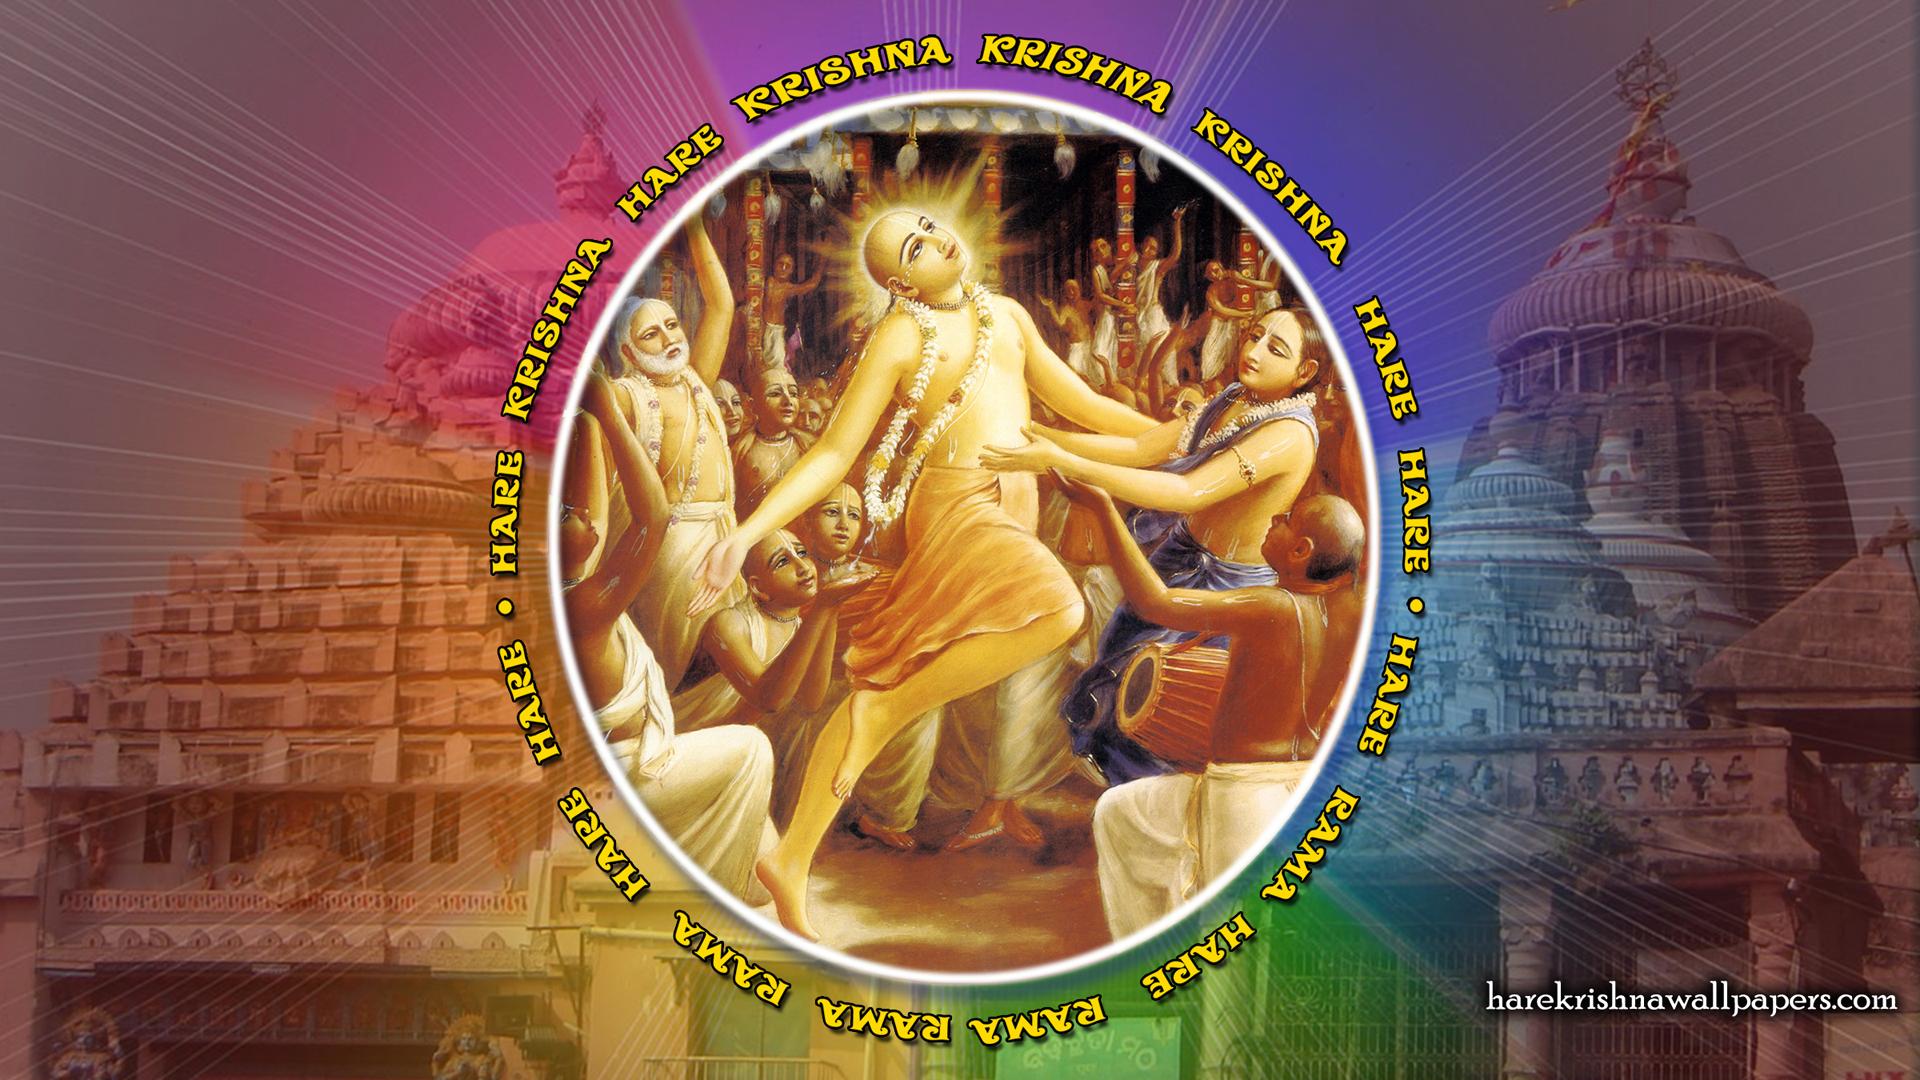 Chant Hare Krishna Mahamantra Wallpaper (009) Size 1920x1080 Download